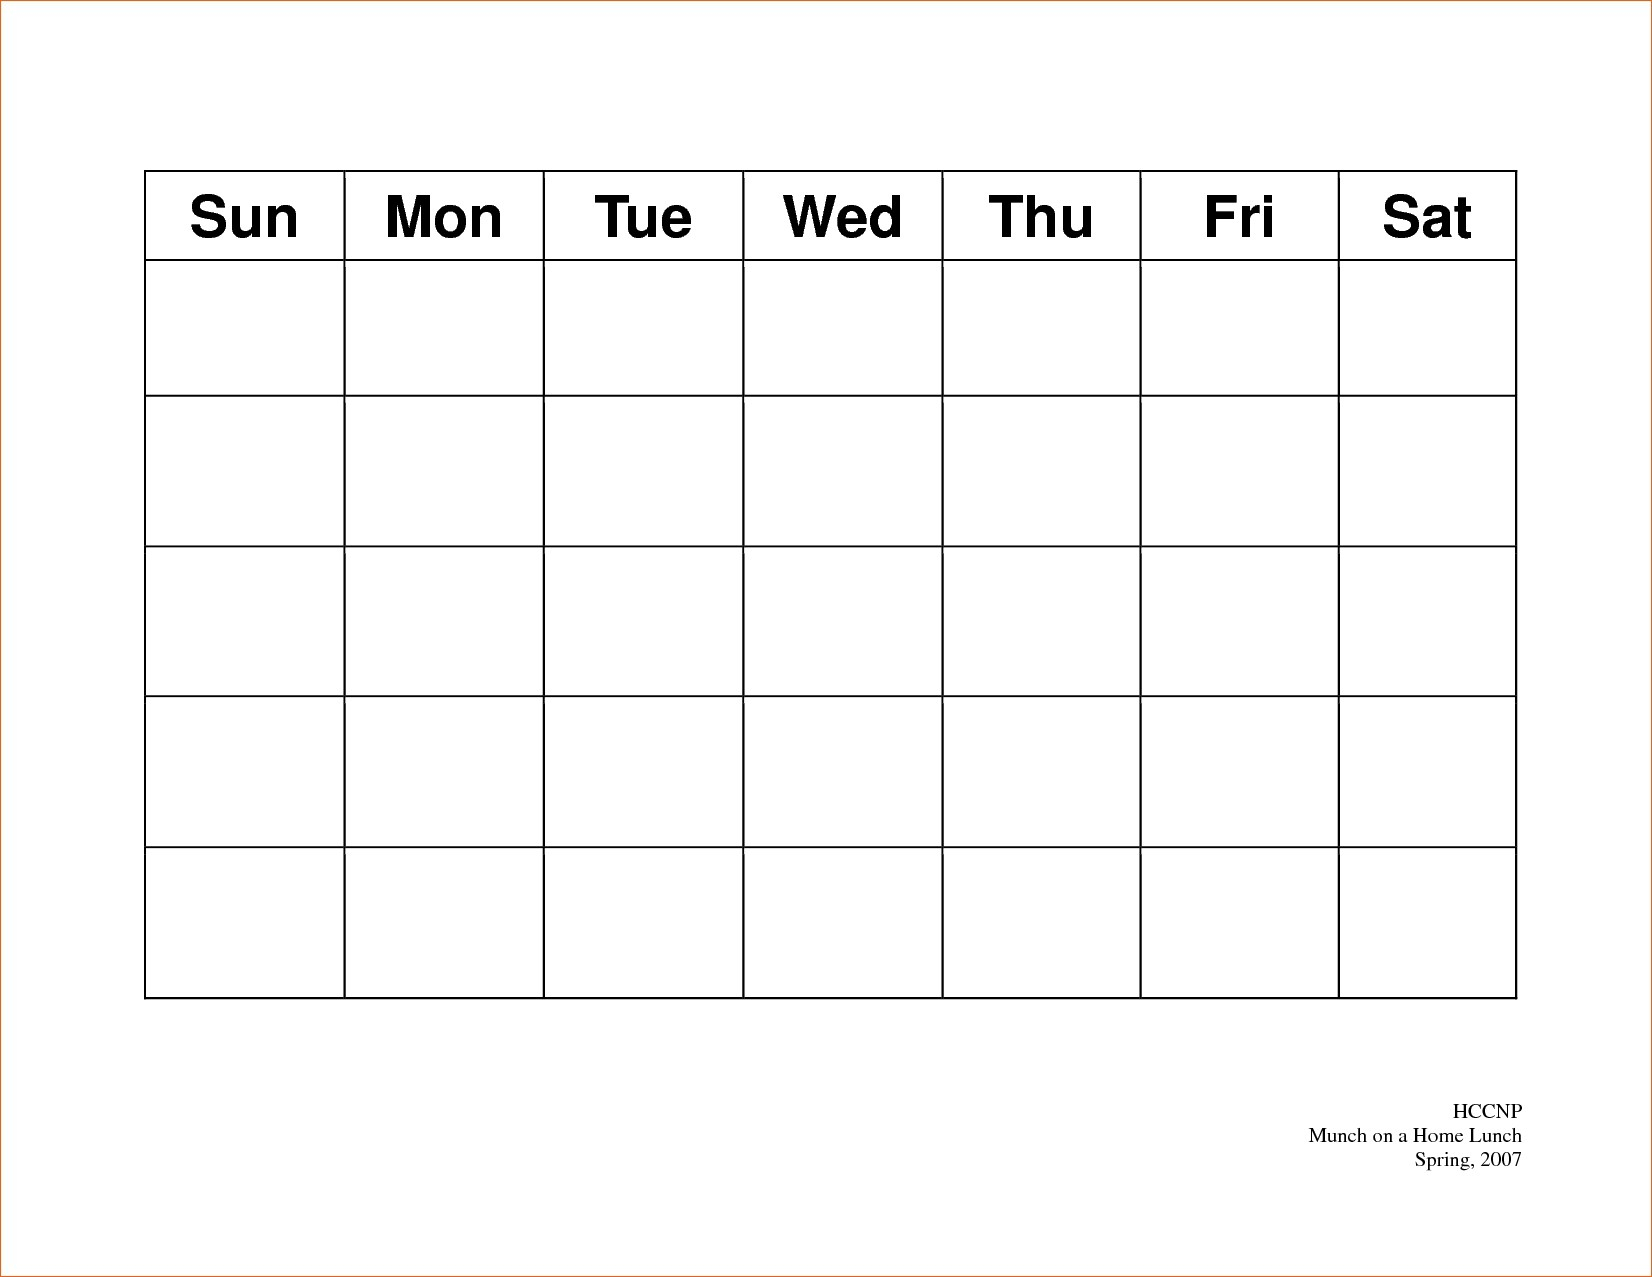 Calendar 5 Day Weekly Calendar Template On 5 Week Calendar Template in 5 Day Calendar Template Free